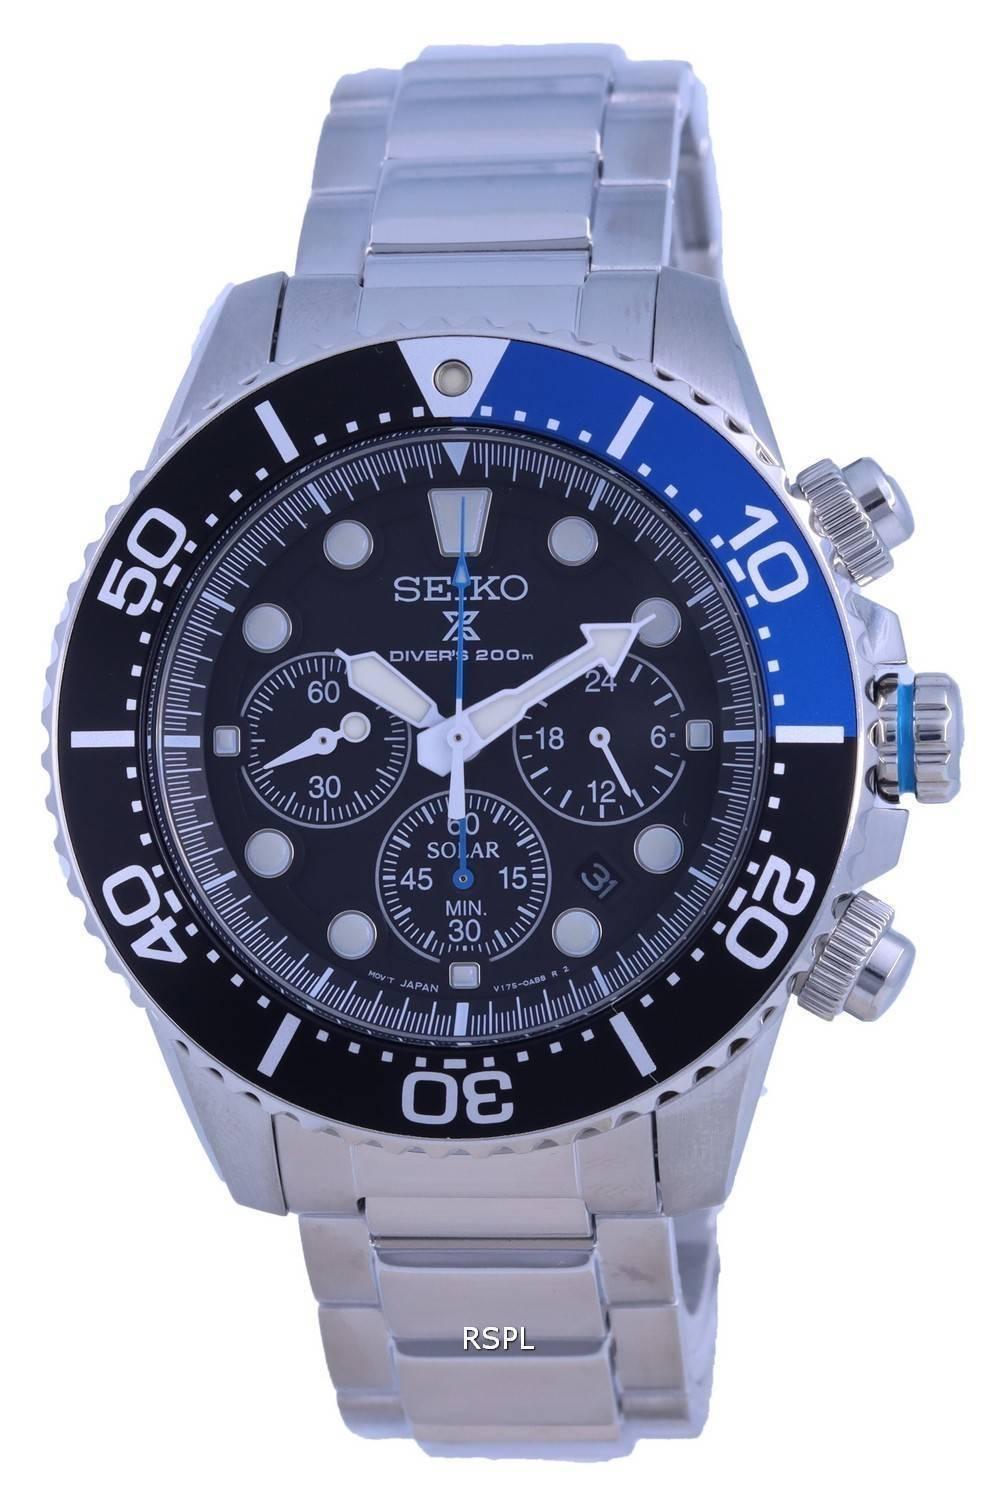 Seiko Prospex Chronograph Solar Divers SSC781 SSC781P1 SSC781P 200M Mens Watch